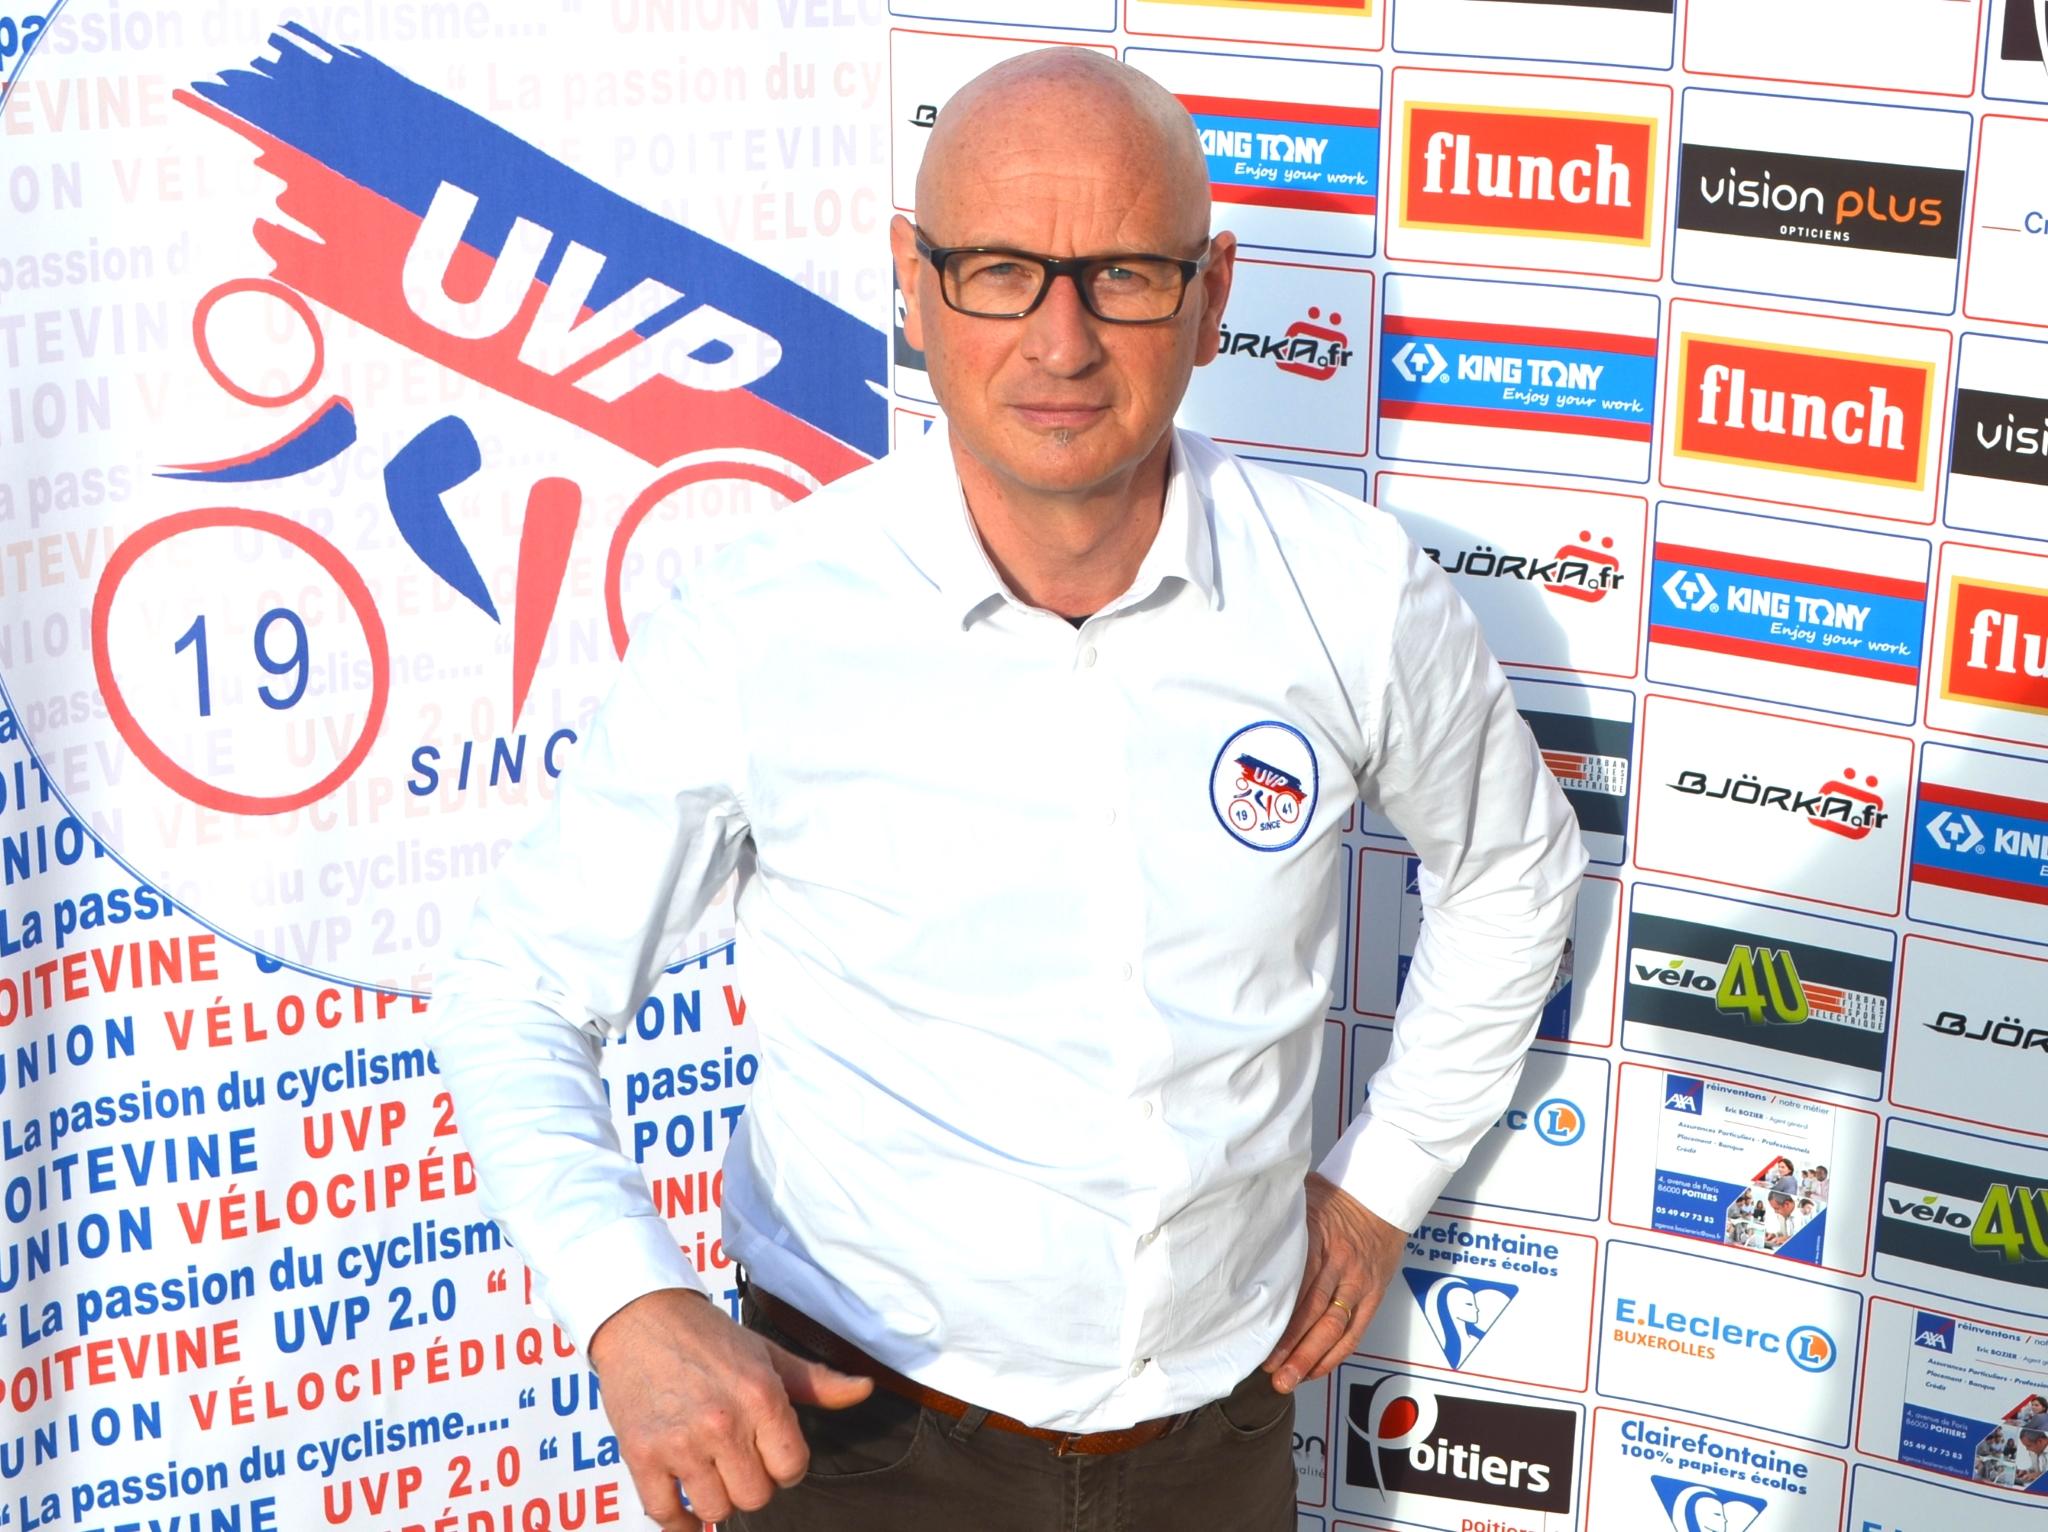 Stéphane PUYGRENIER